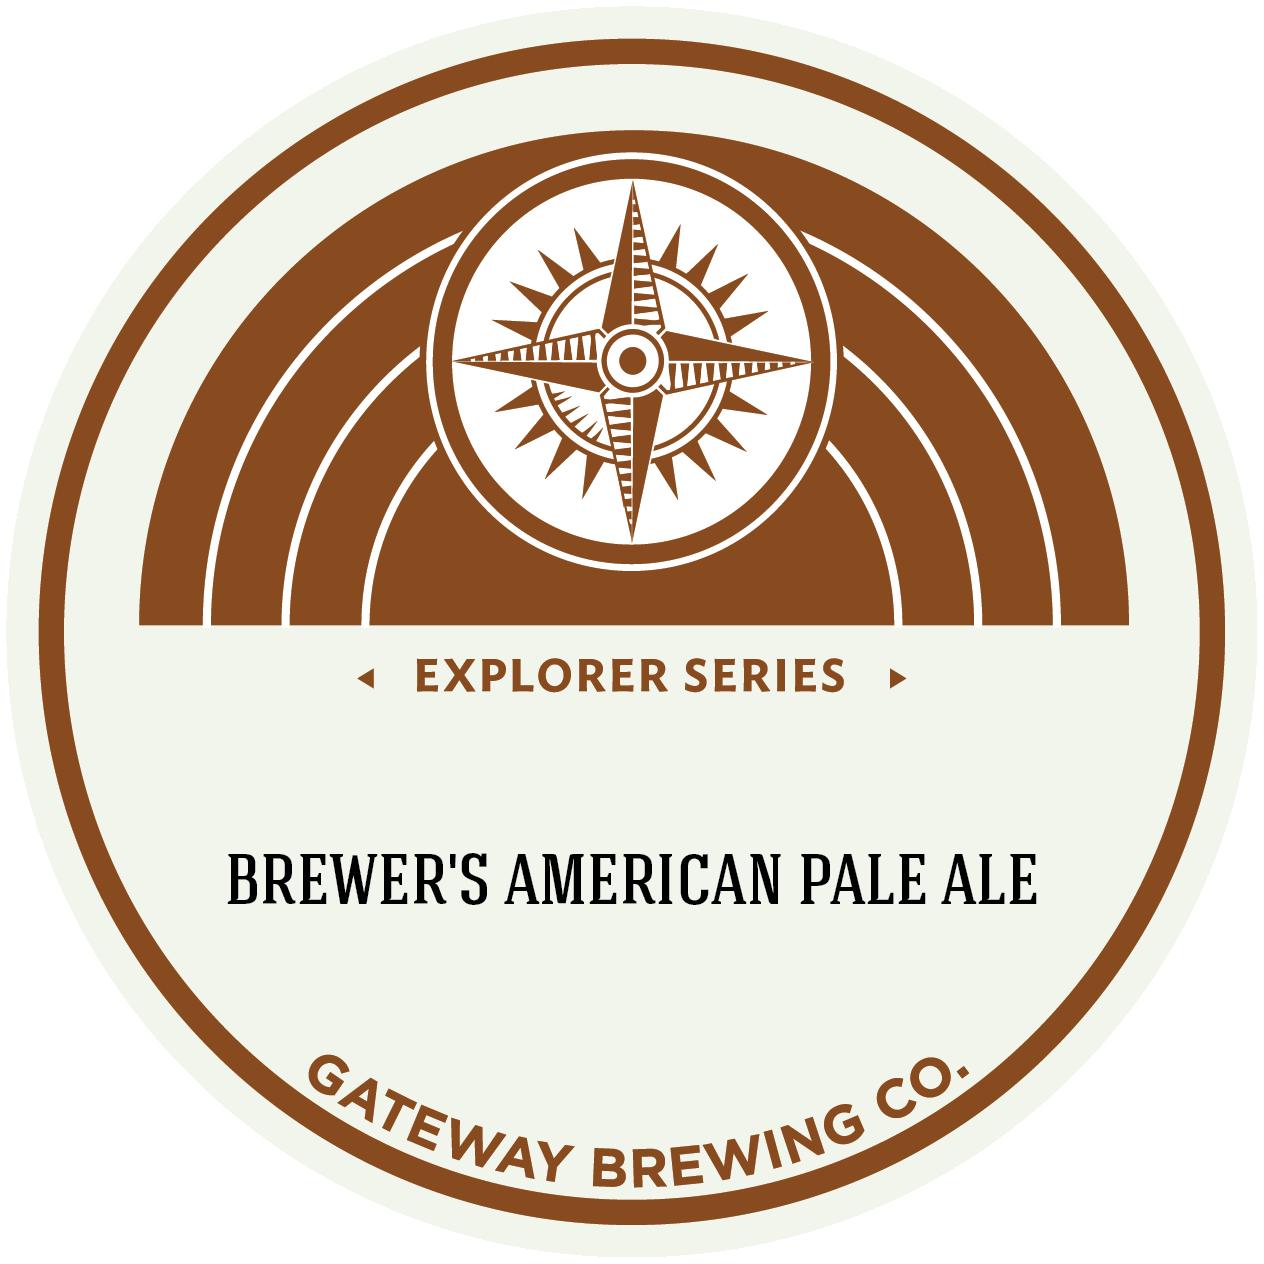 Brewer's American Pale Ale